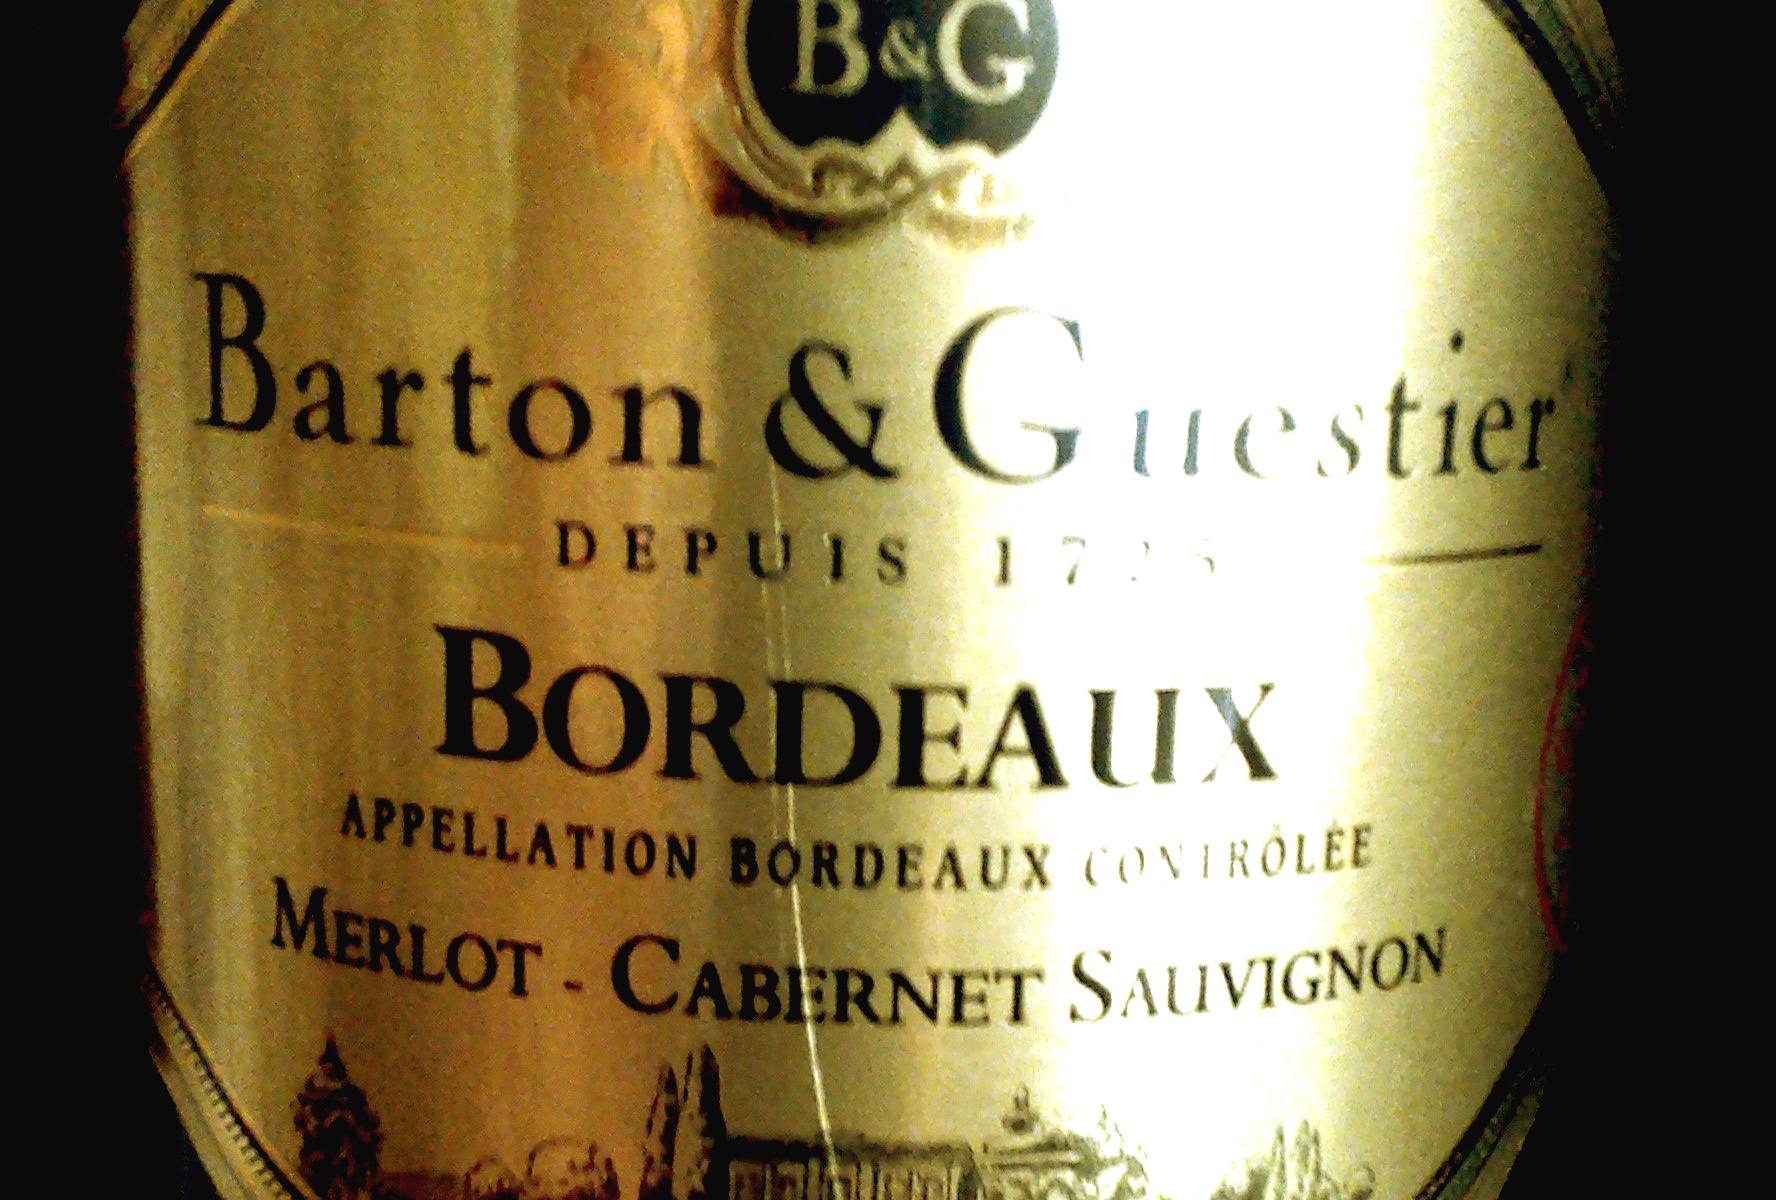 Barton & Guestier Merlot – Cabernet Sauvignon Bordeaux 2010